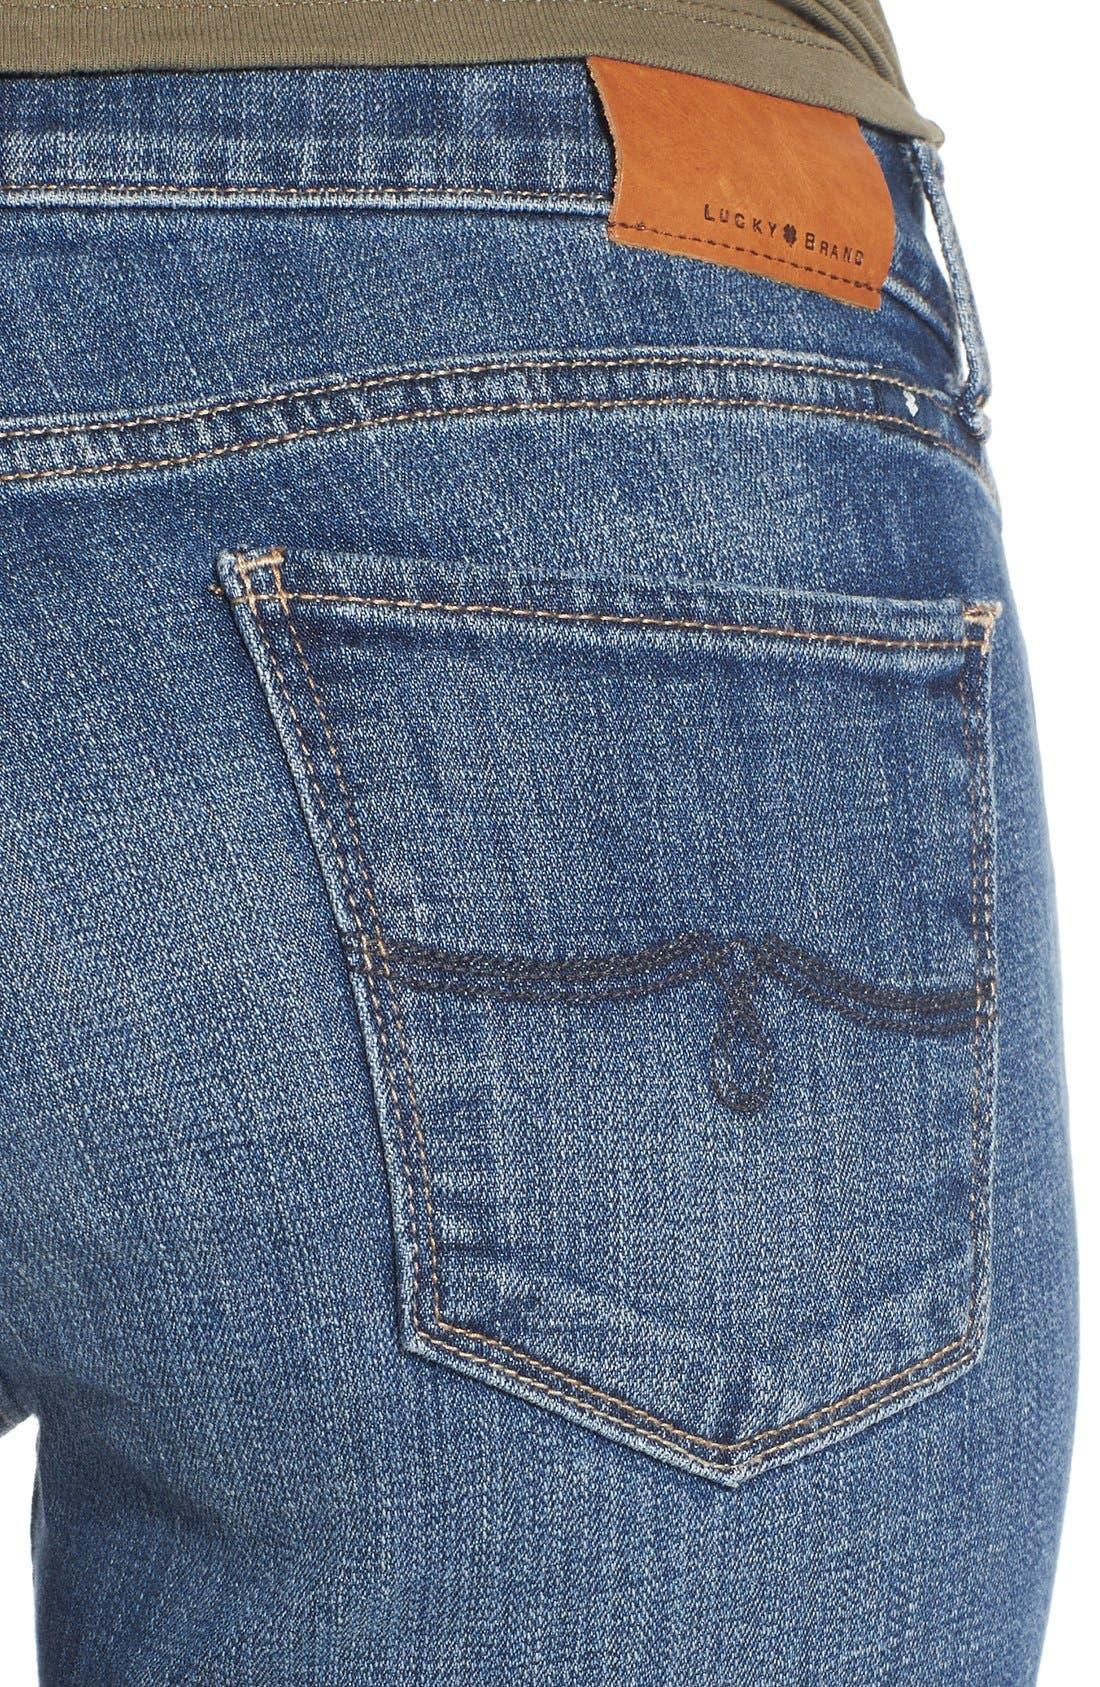 Alternate Image 5  - Lucky Brand 'Lolita' Distressed Stretch Skinny Jeans (Morrison)